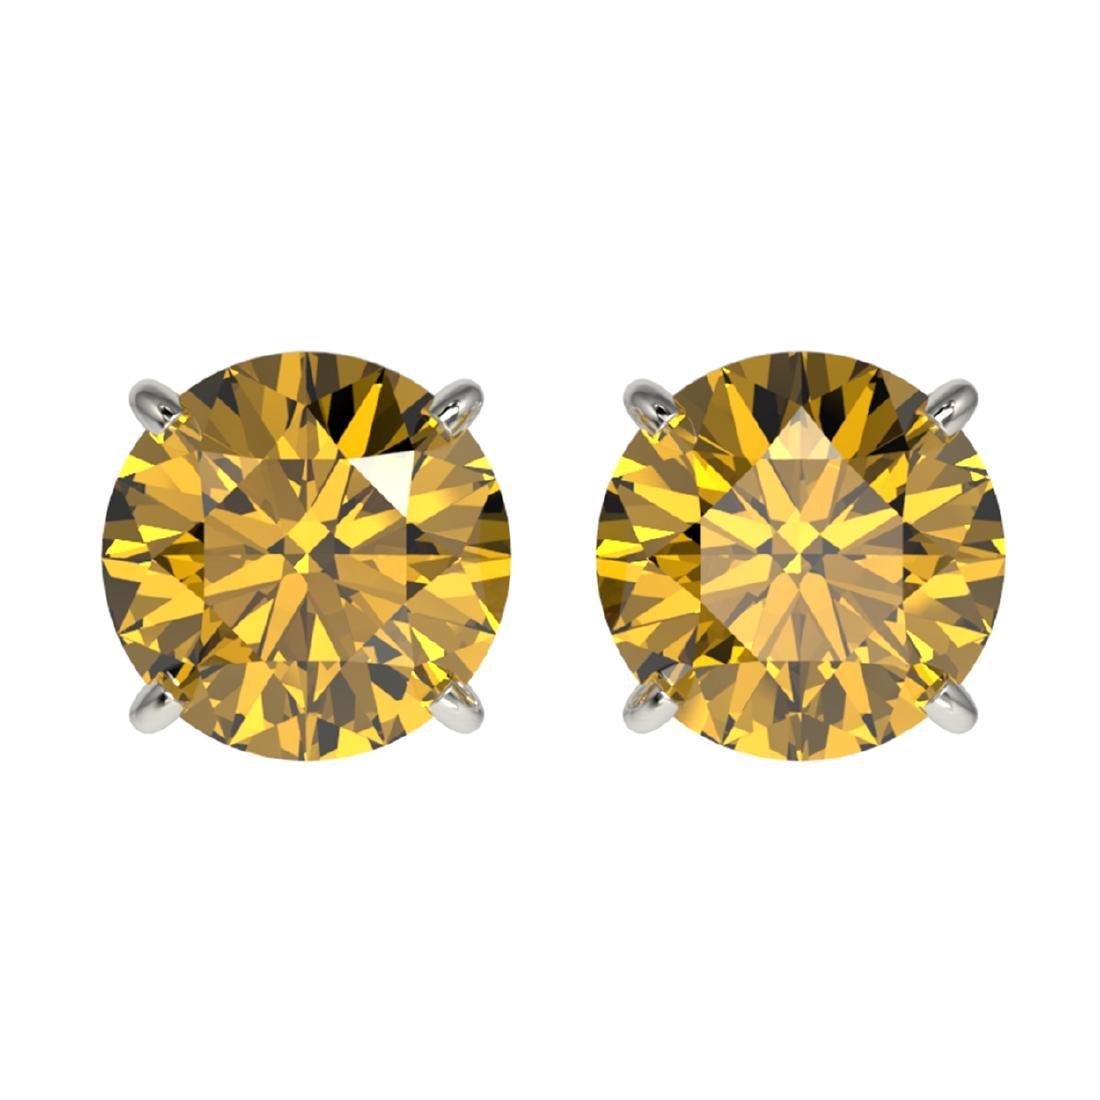 2.11 ctw Intense Yellow Diamond Stud Earrings 10K White